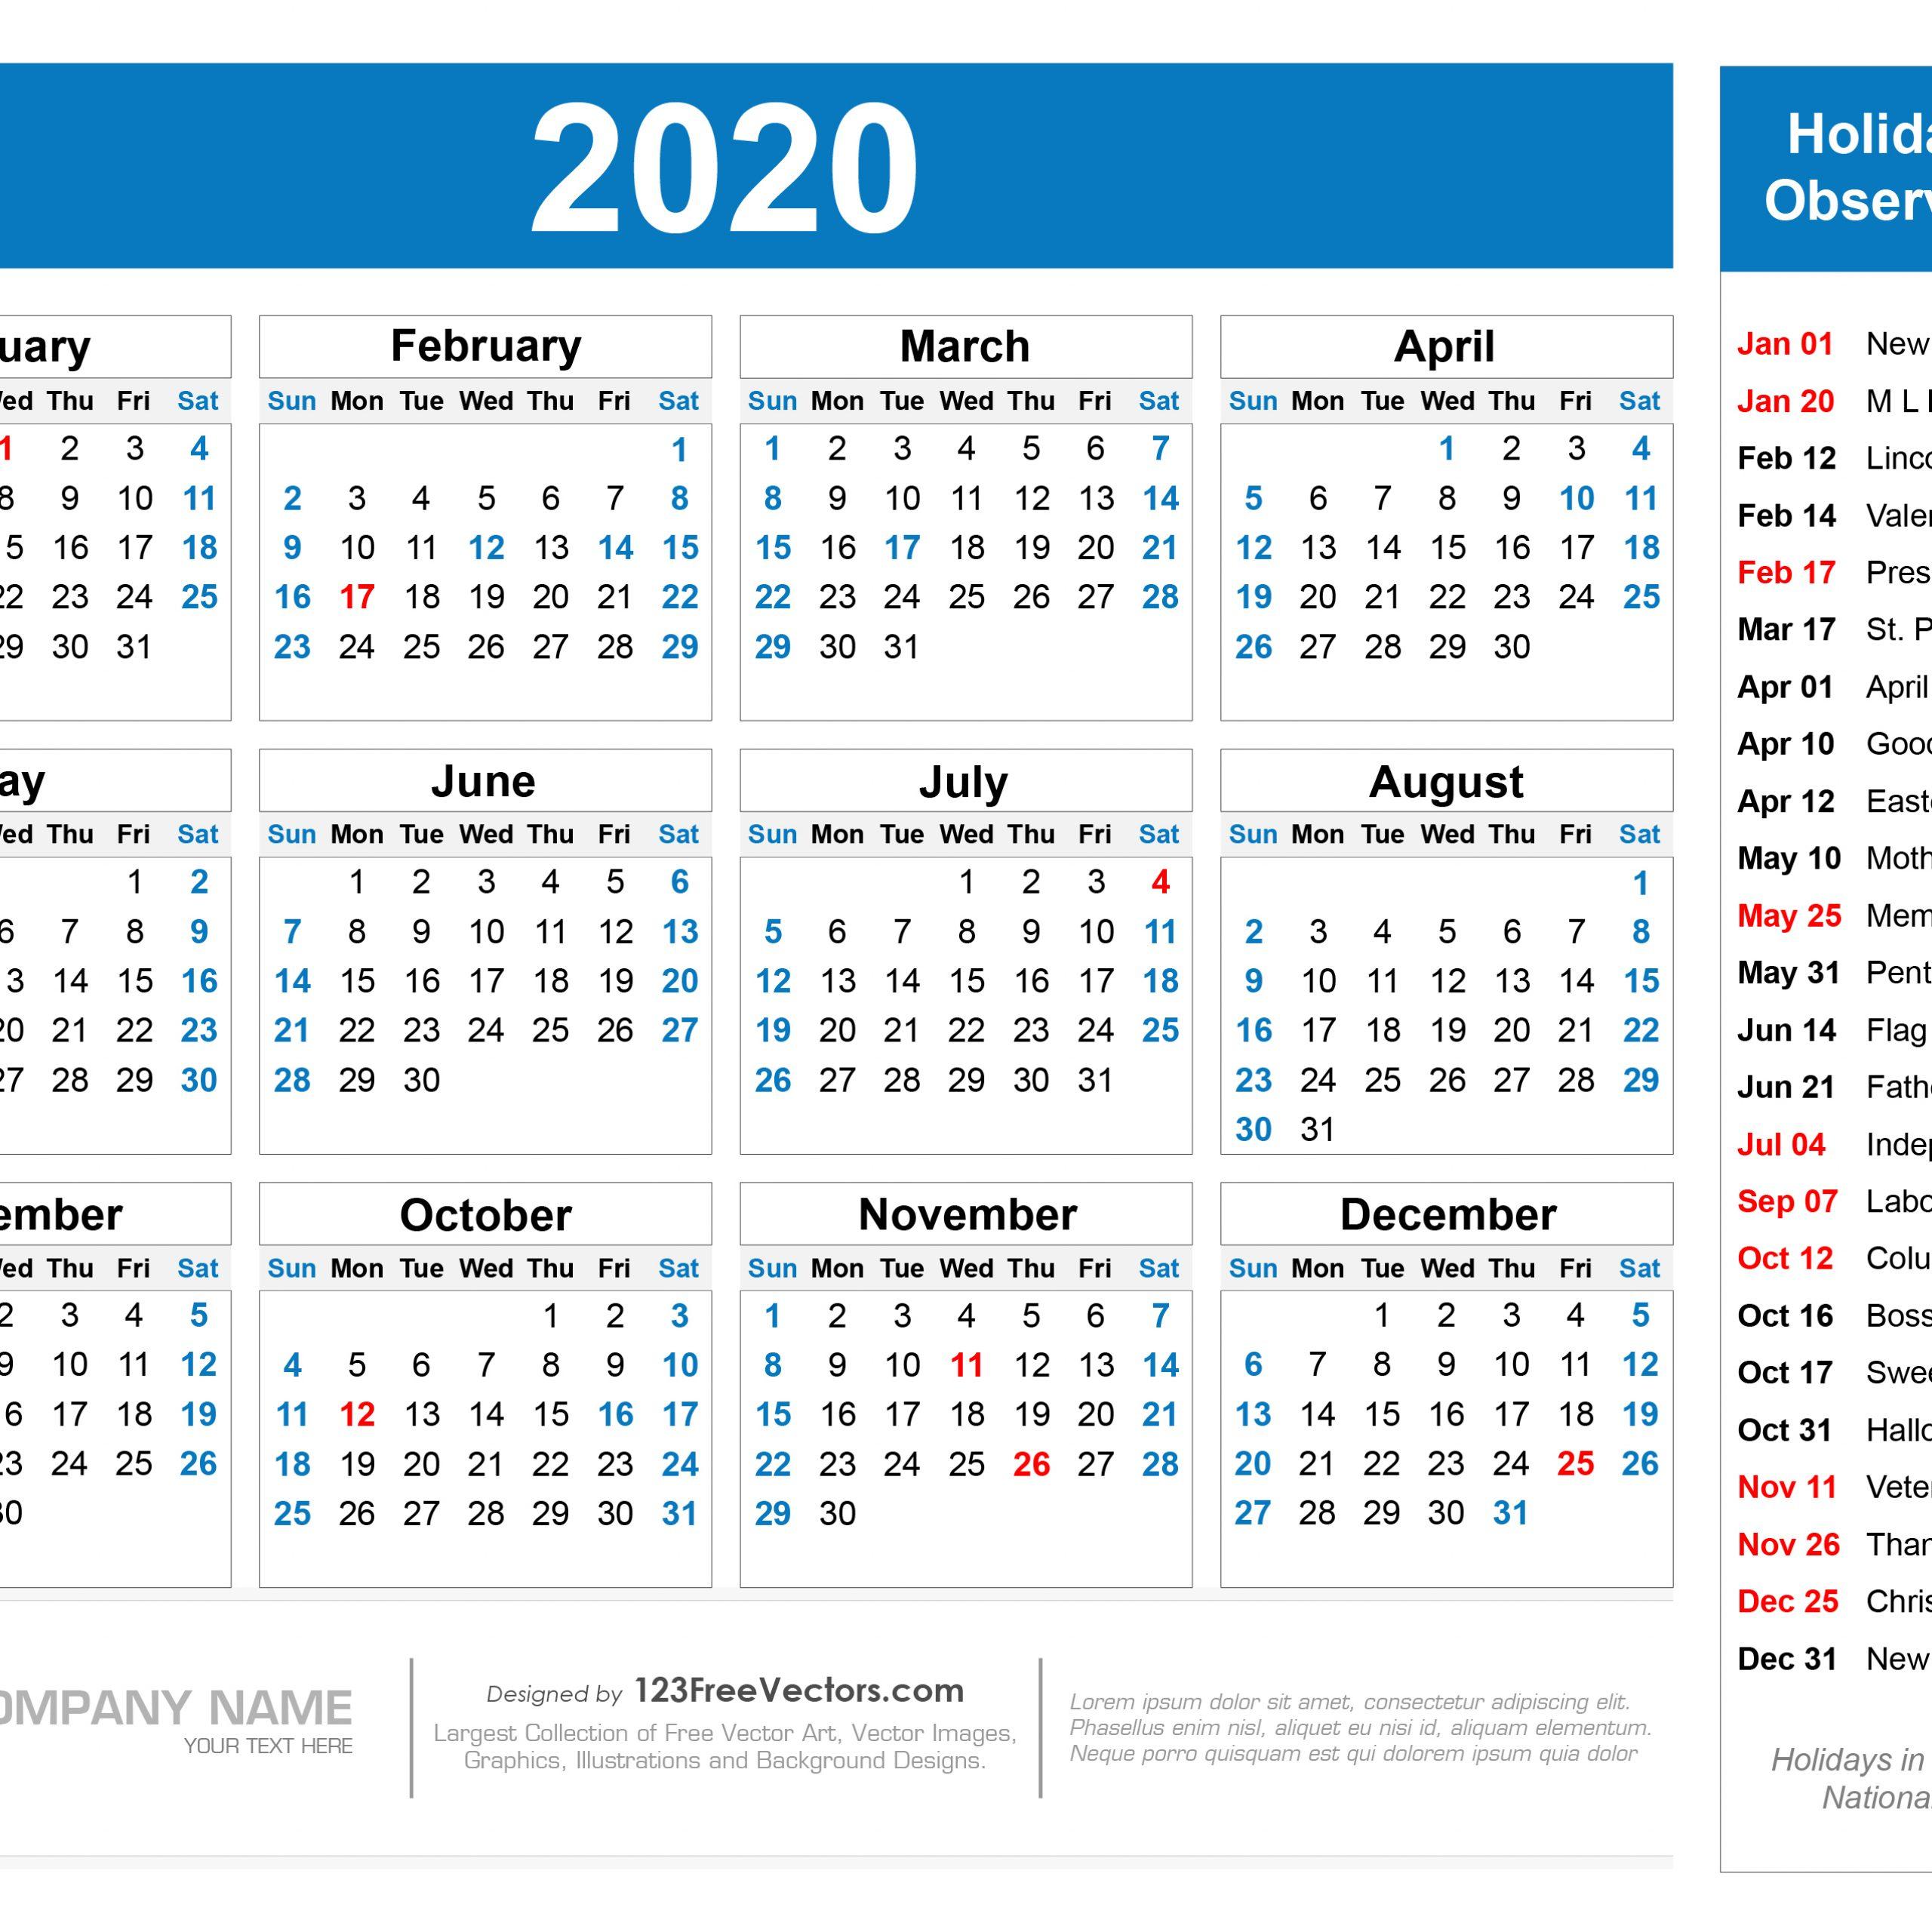 2020 Printable Vacation Calendar | Free Printable Calendar